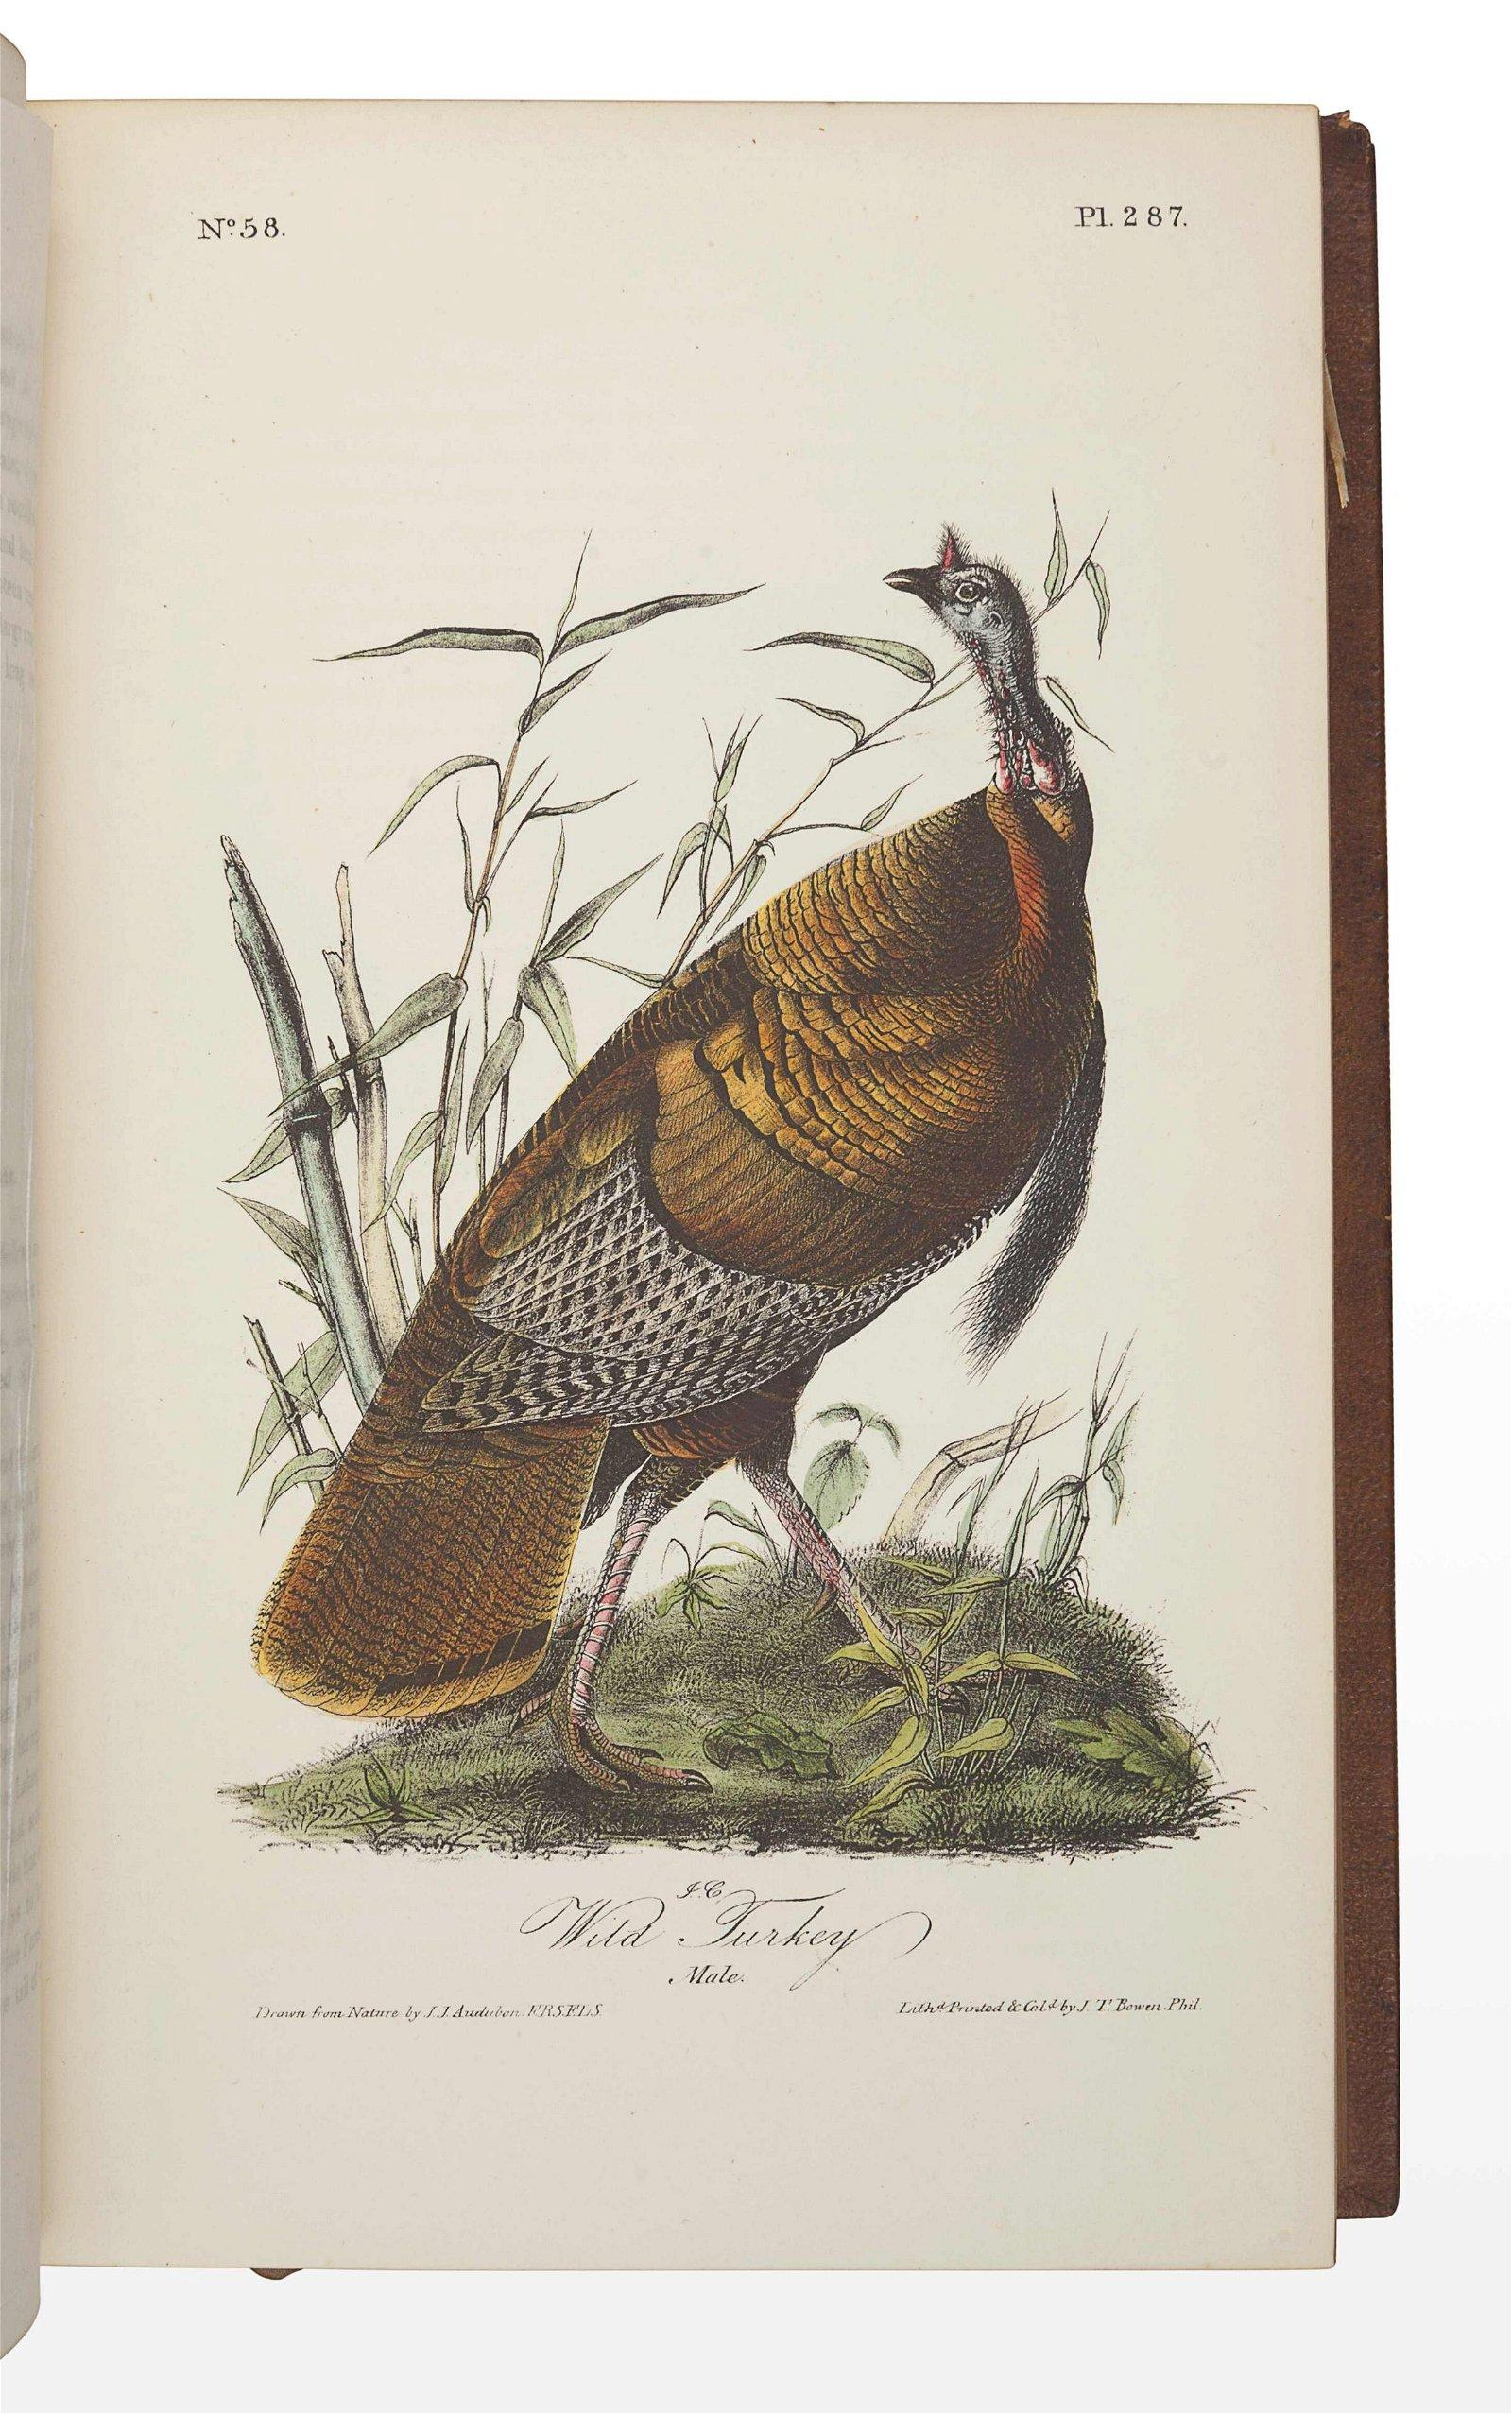 AUDUBON, John James (1785-1851). The Birds of America,